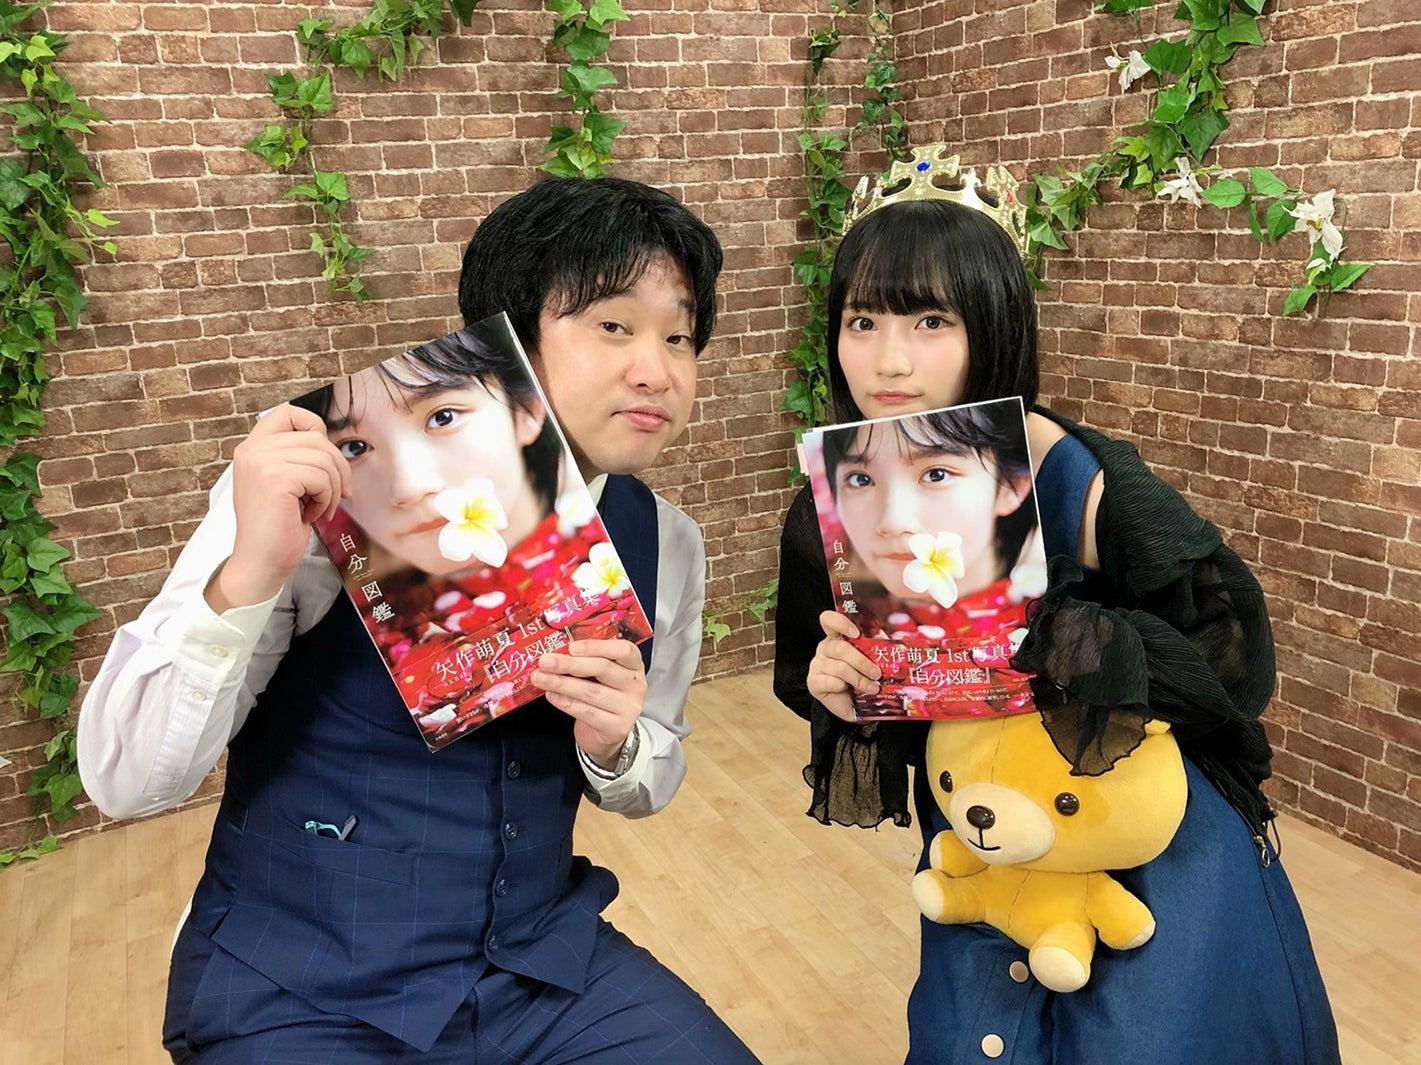 AKB48新センター矢作萌夏、初写真集は「健全だけどセクシーが